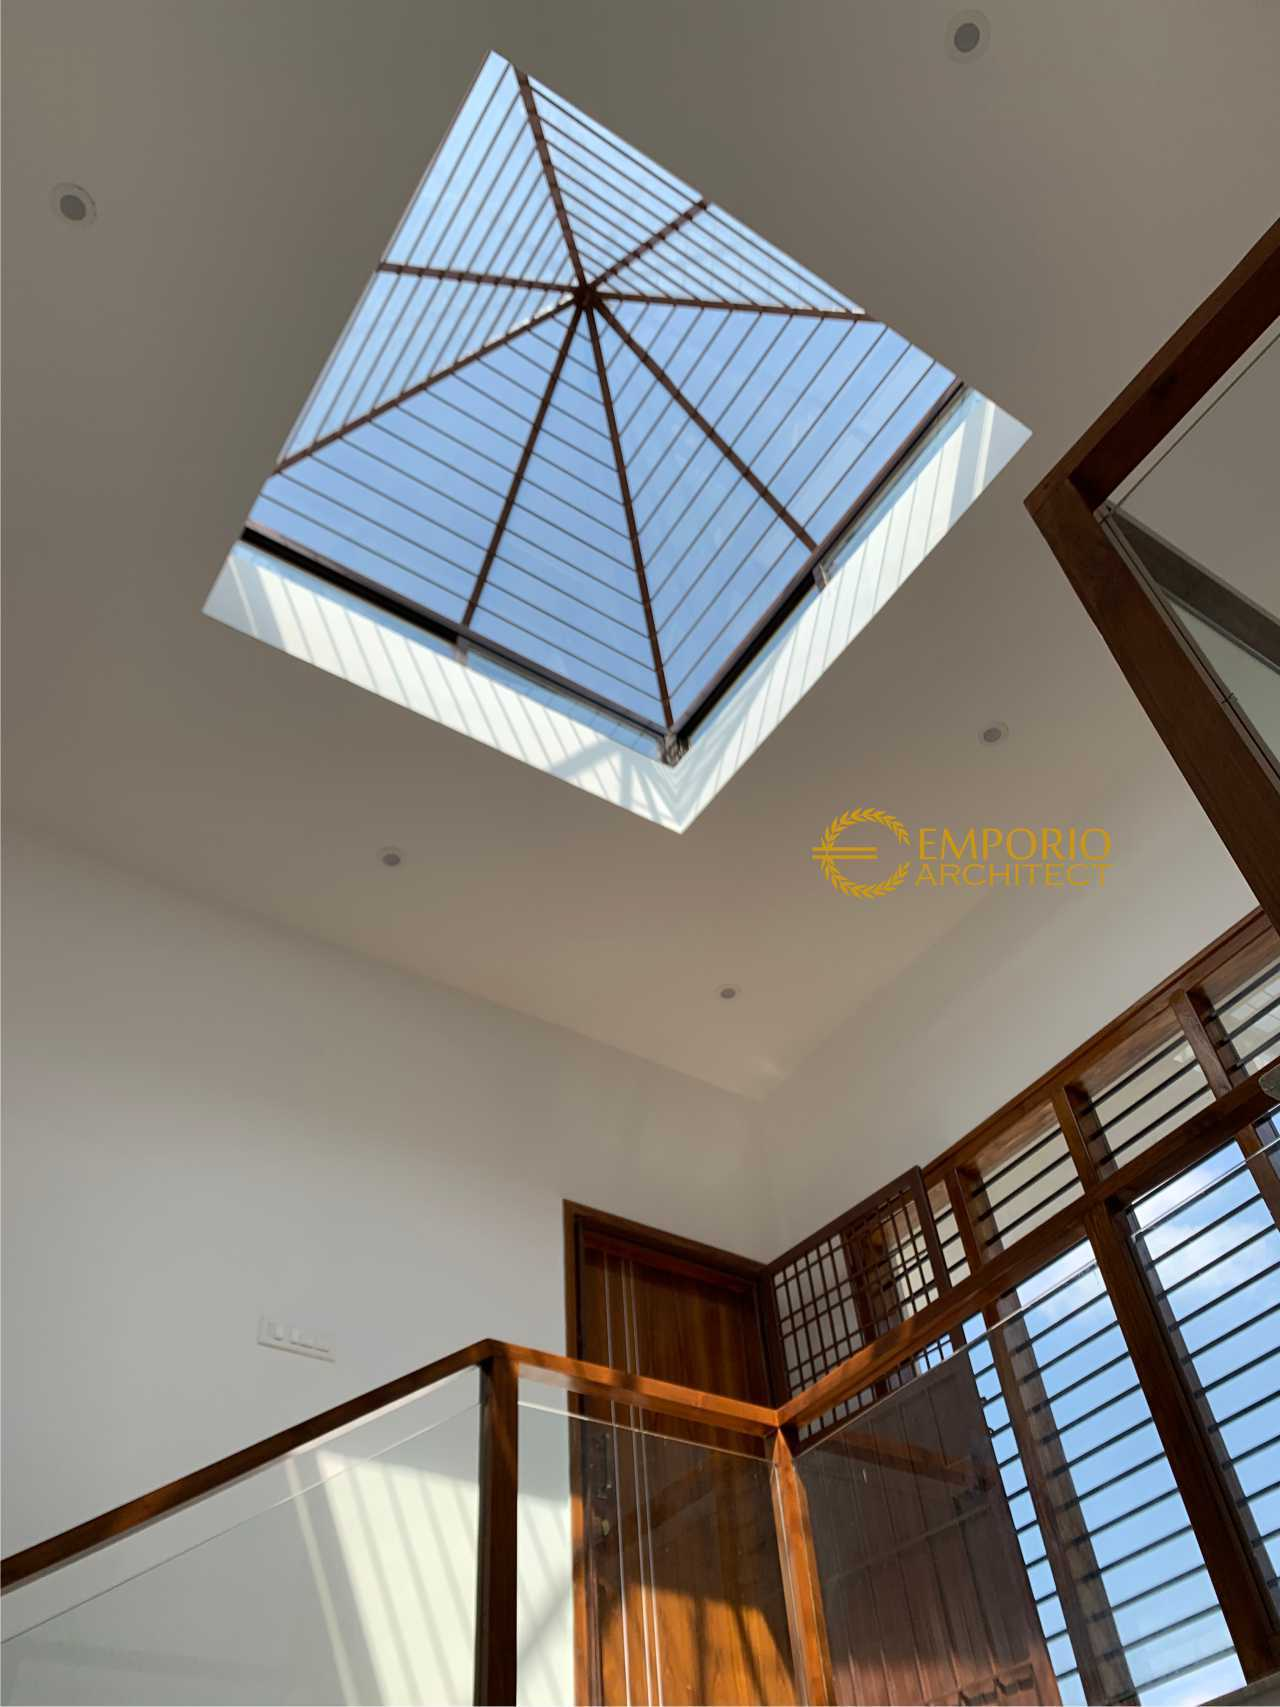 Emporio Architect Jasa Arsitek India Hasil Konstruksi Rumah Modern Tropis 422 @ Banglore, India Bengaluru, Karnataka, India Bengaluru, Karnataka, India Emporio-Architect-Jasa-Arsitek-India-Hasil-Konstruksi-Rumah-Modern-Tropis-422-Banglore-India  85857